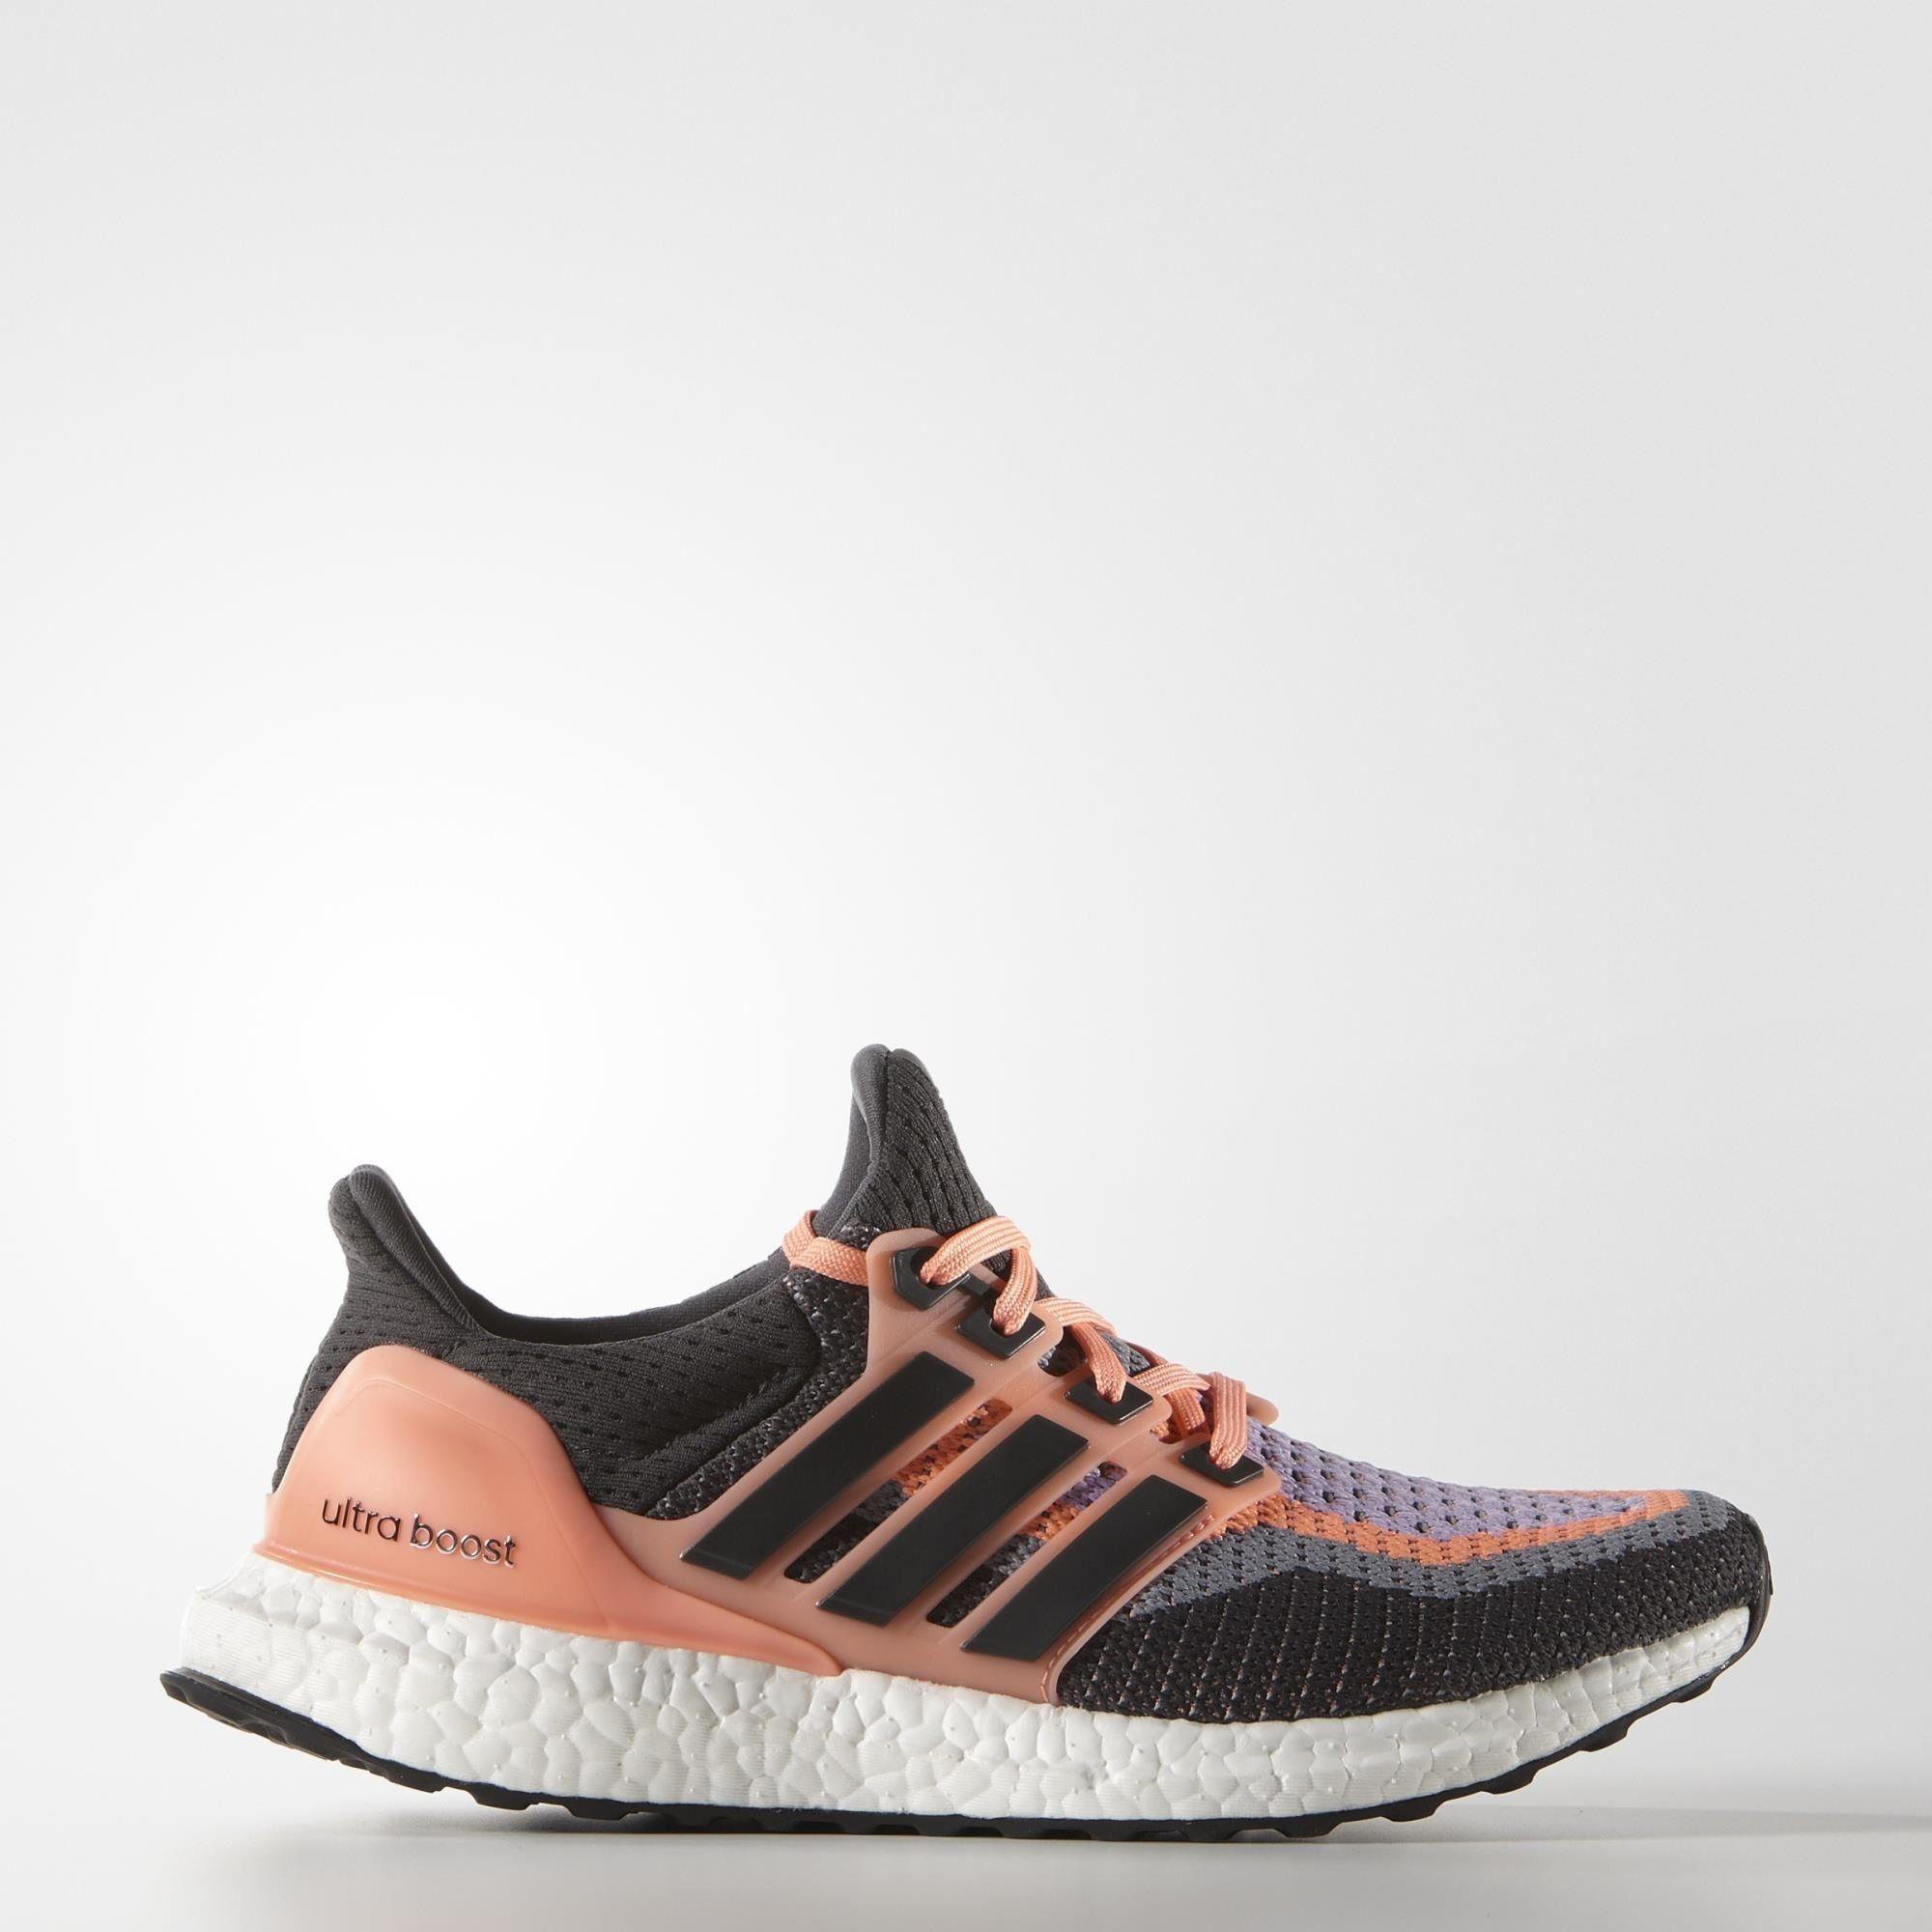 online retailer cb476 92ecd adidas - Ultra Boost Shoes